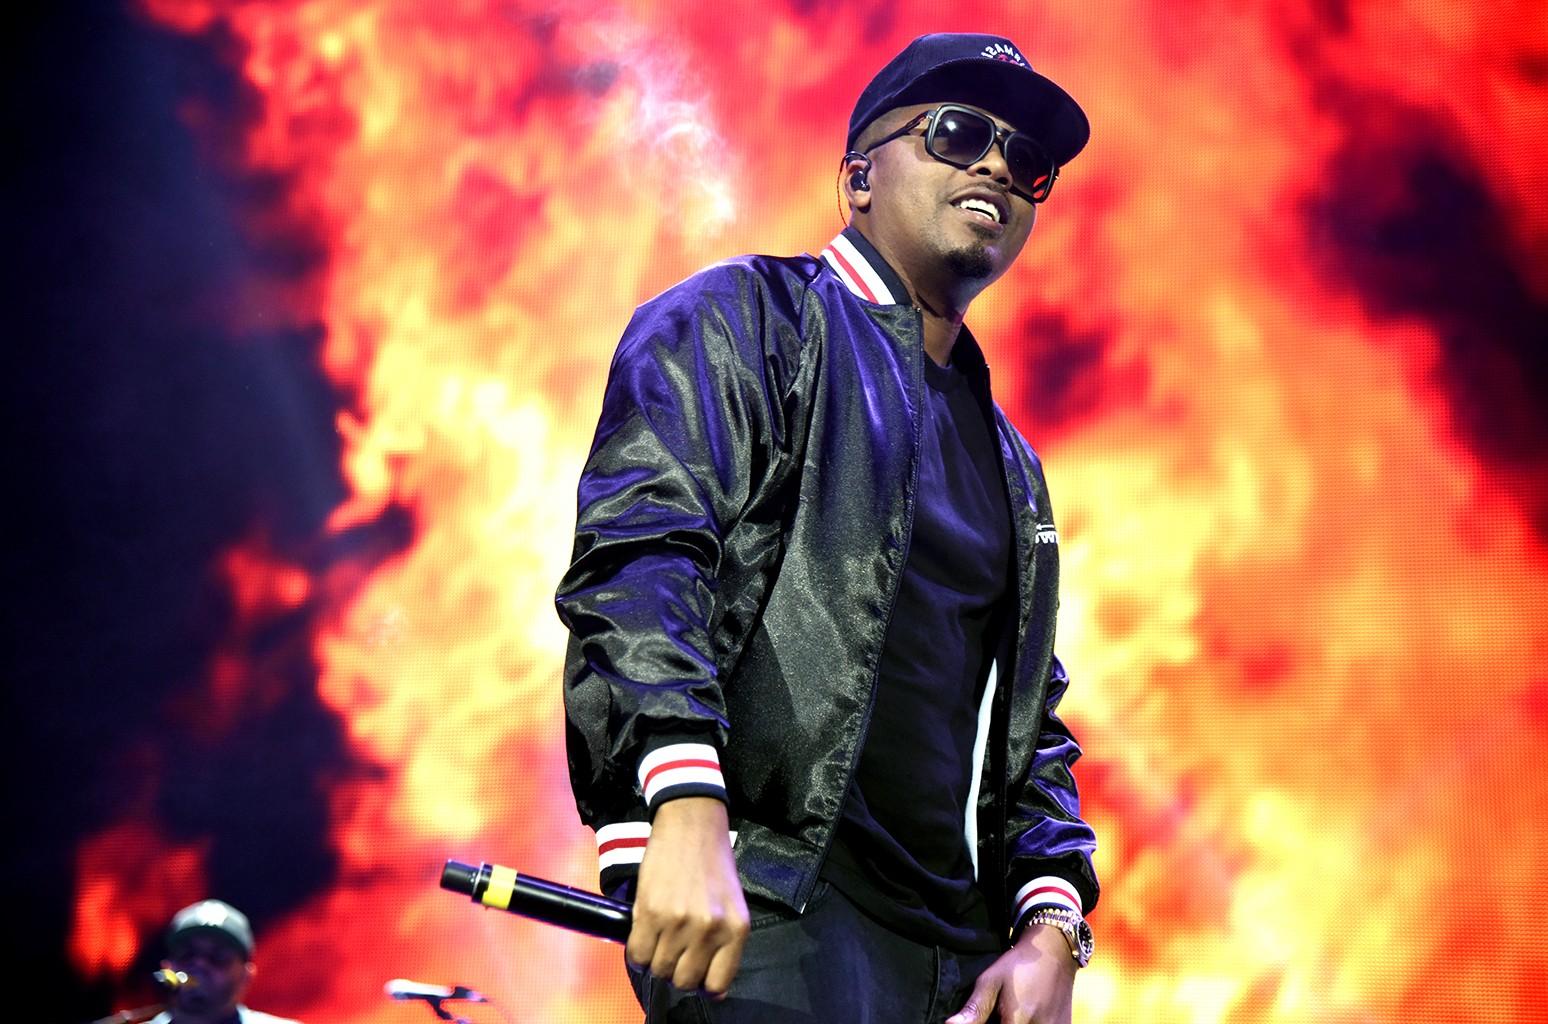 Nas performs at Bill Graham Civic Auditorium on Noc. 3, 2016 in San Francisco.